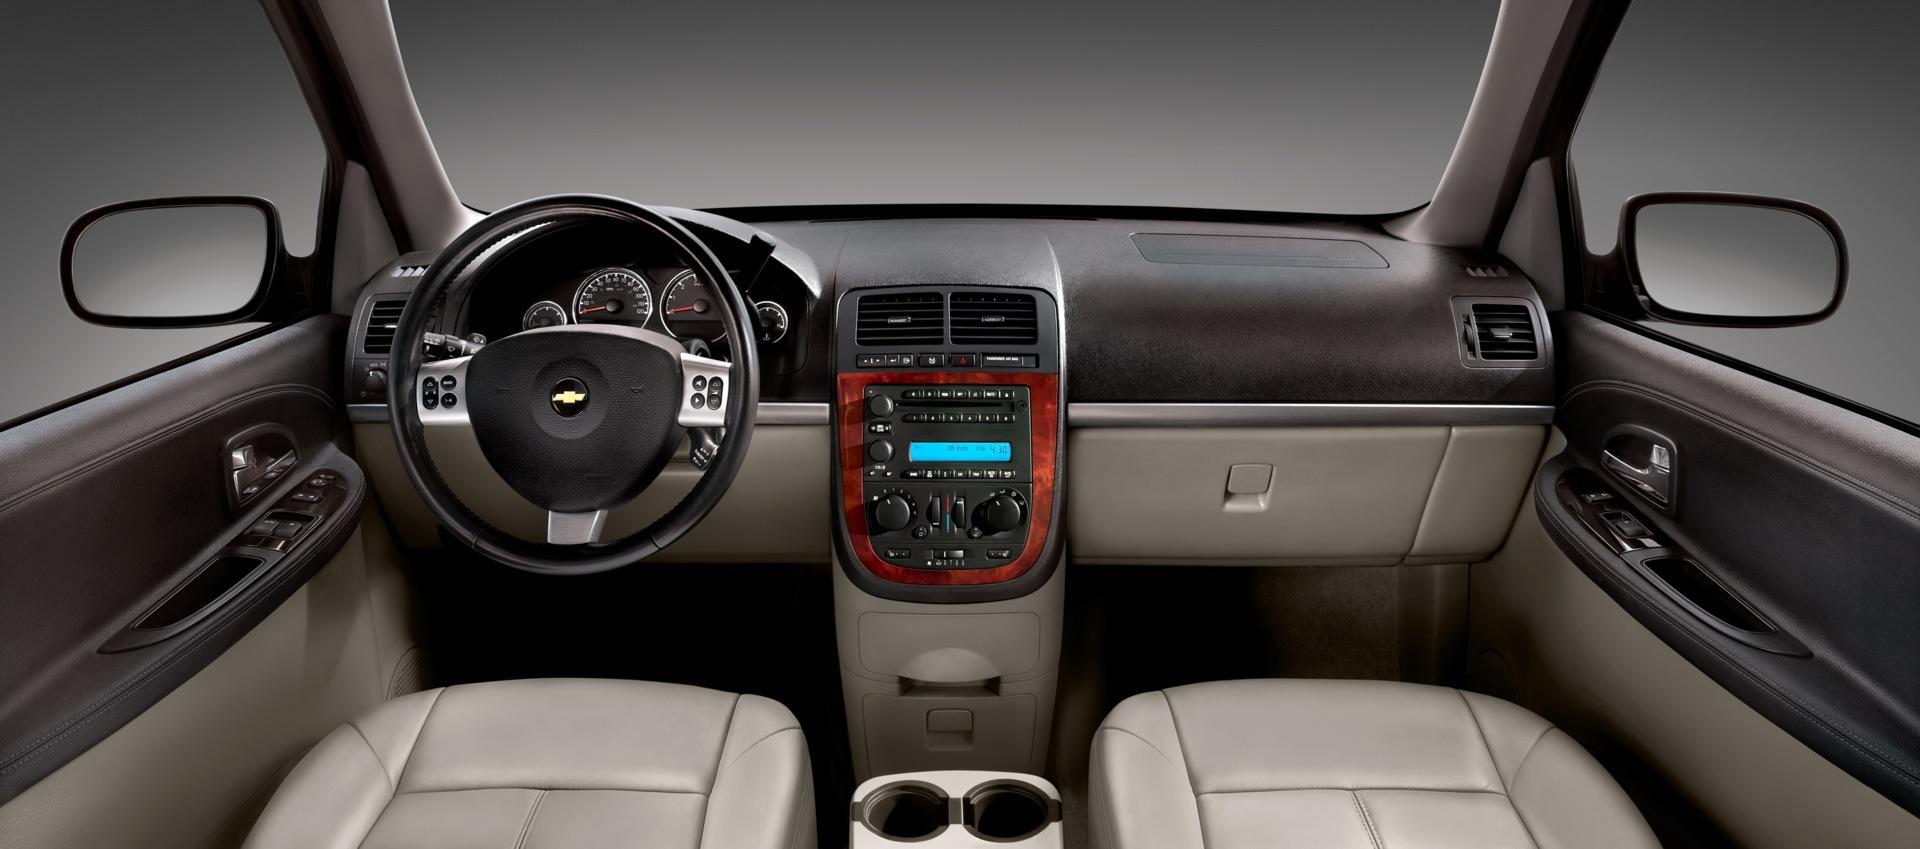 2008 Chevrolet Uplander Image